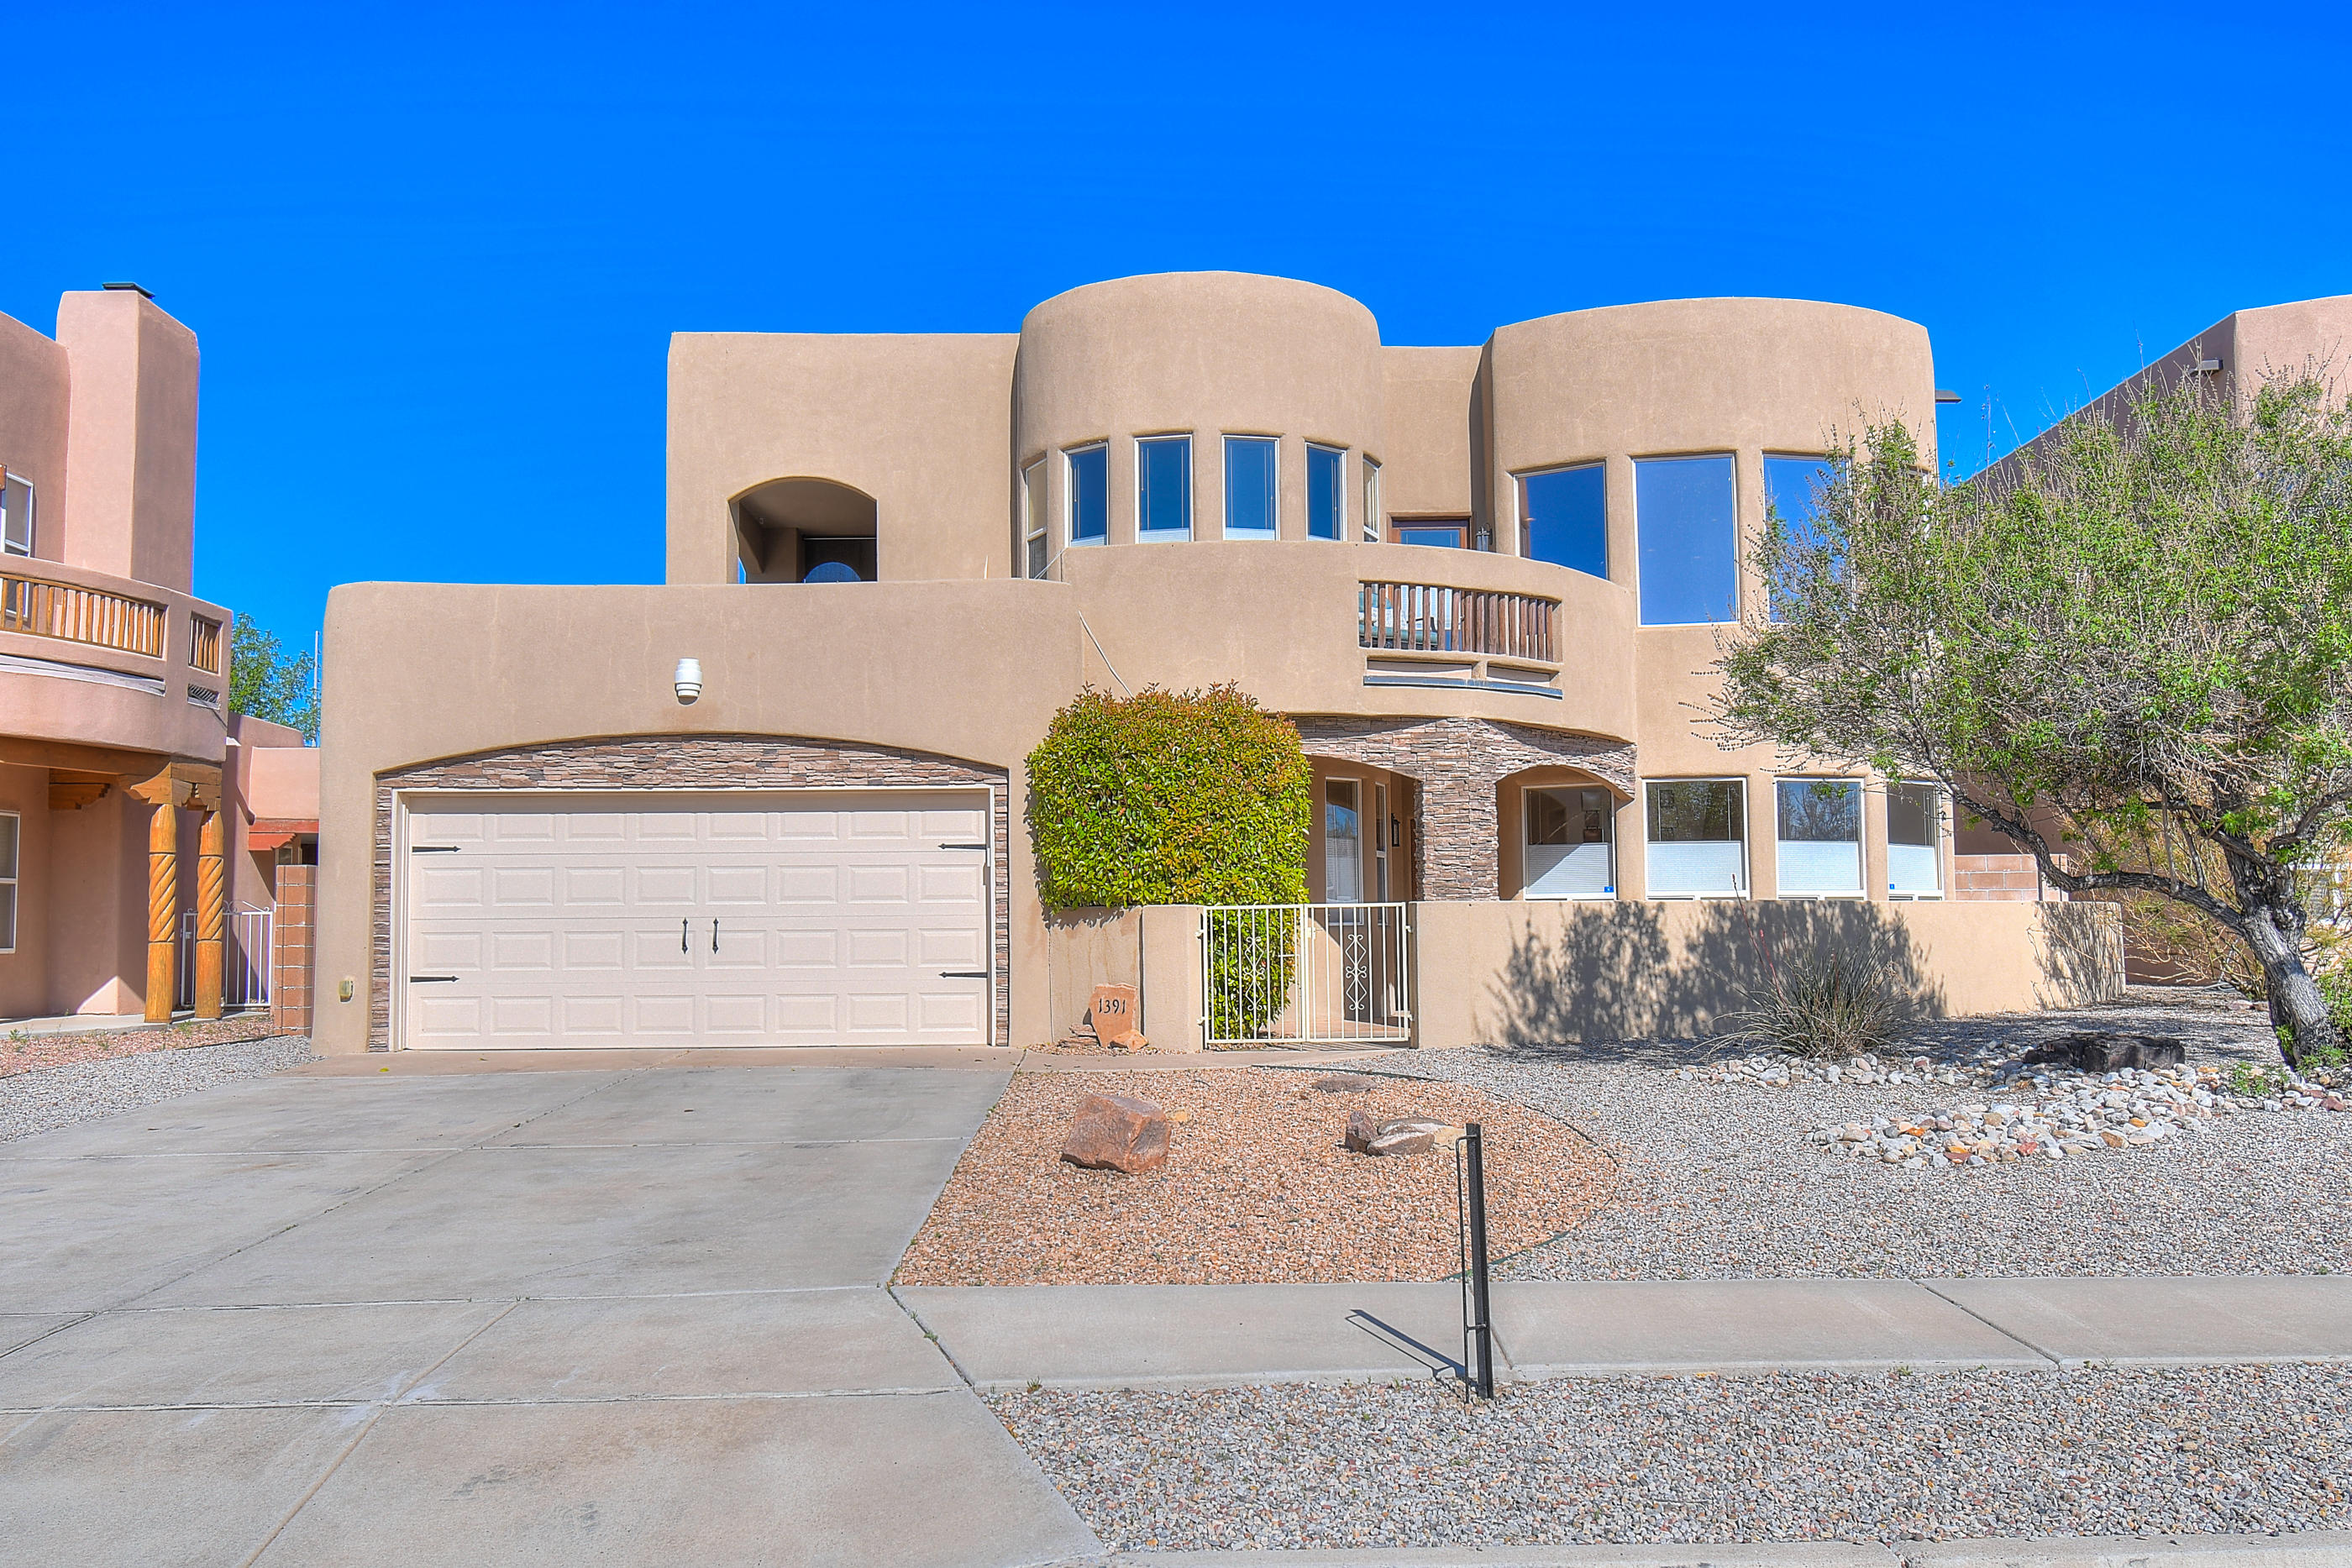 1391 SE Wilkes Way, Rio Rancho, New Mexico